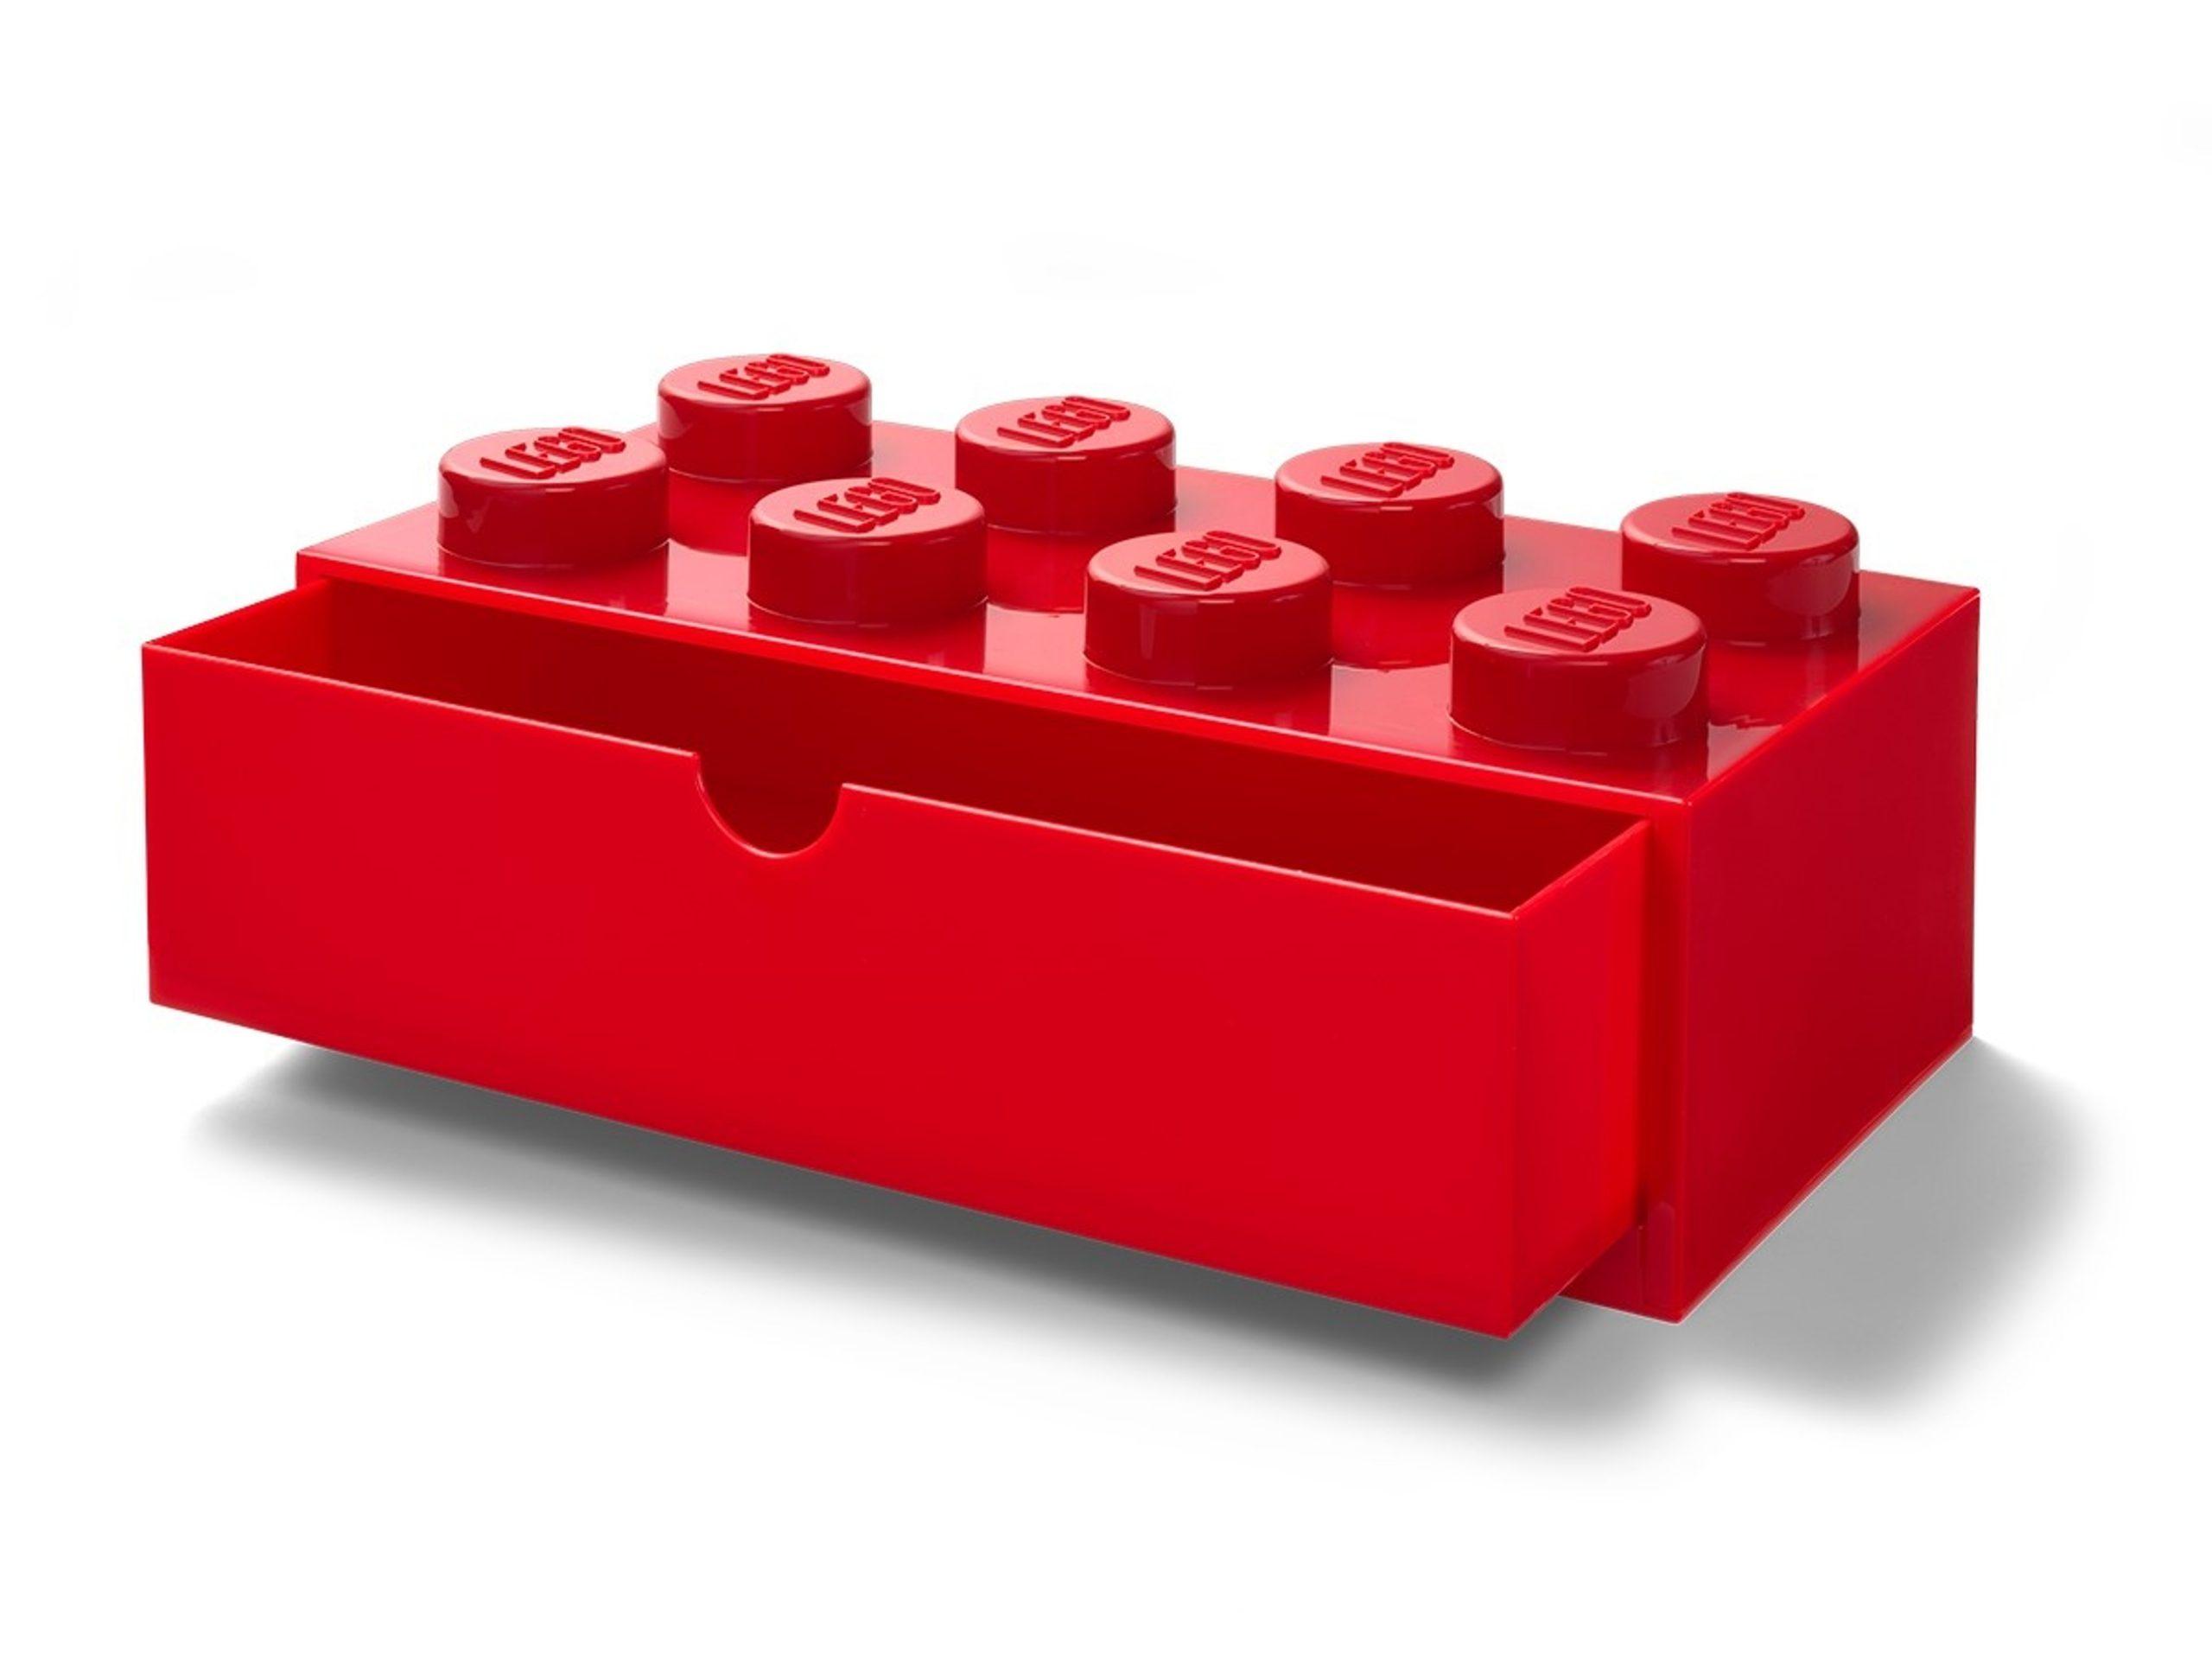 lego 5005871 8 stud red desk drawer scaled